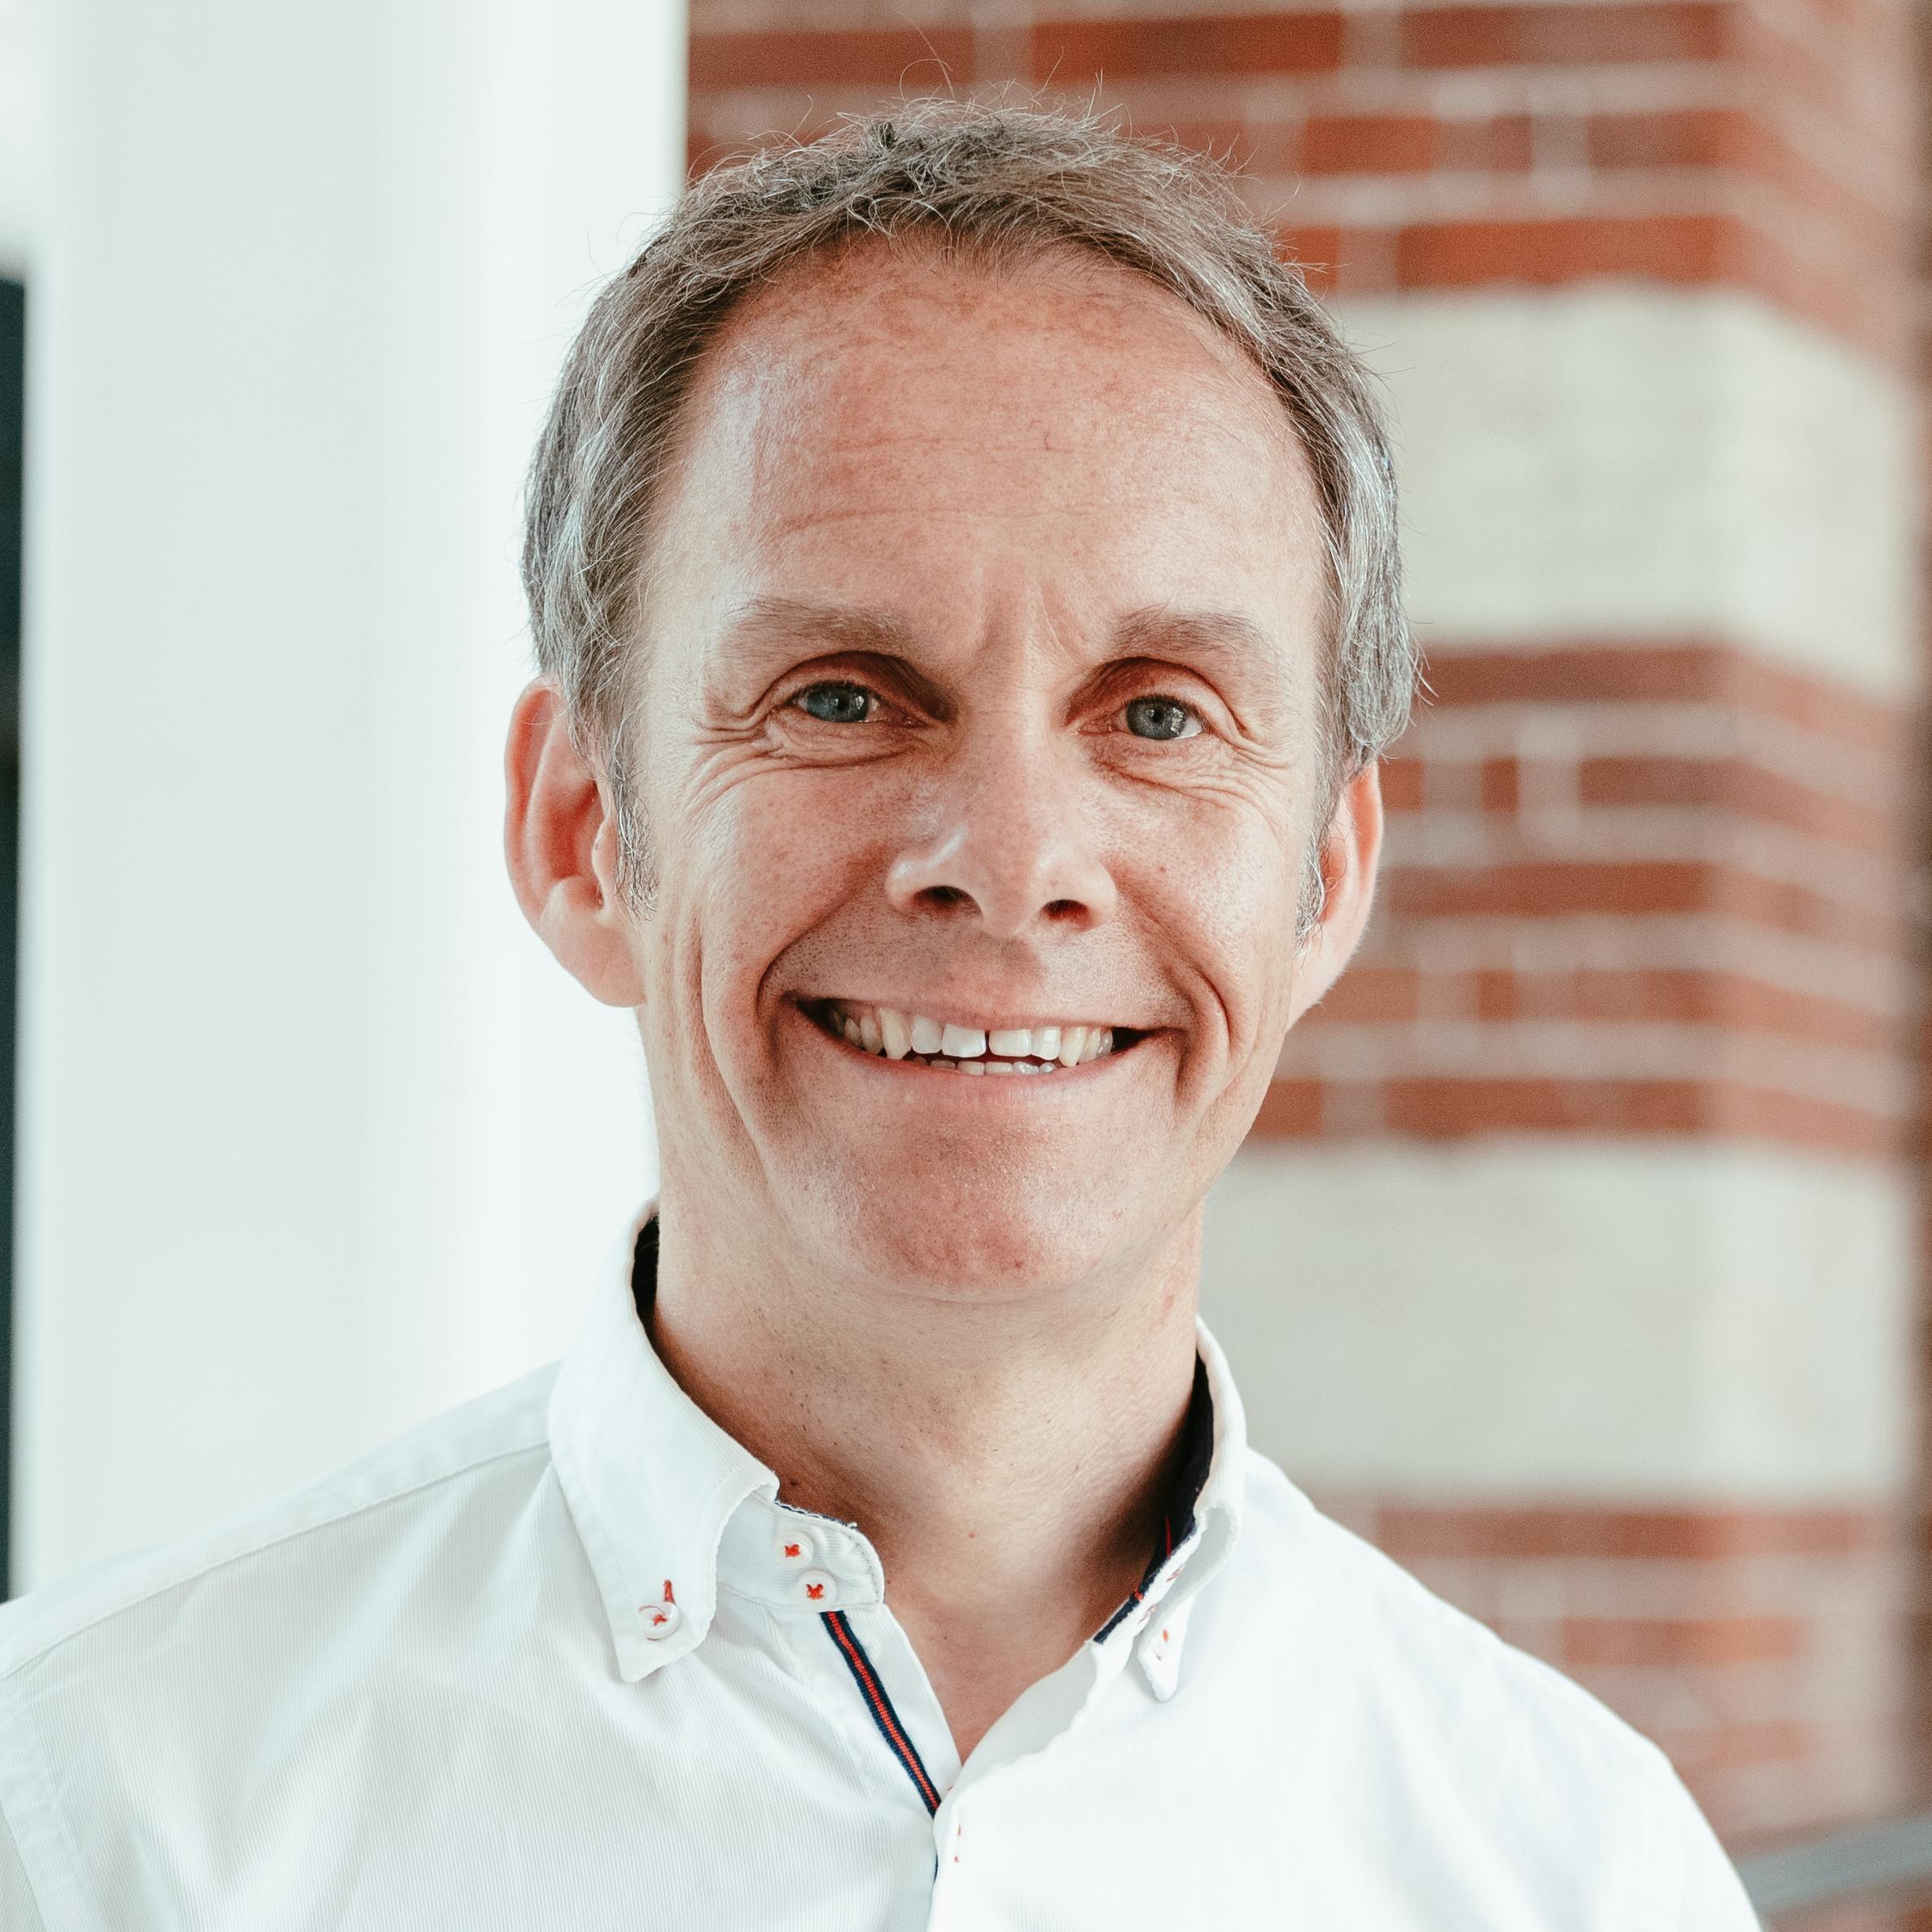 Peter Andrews